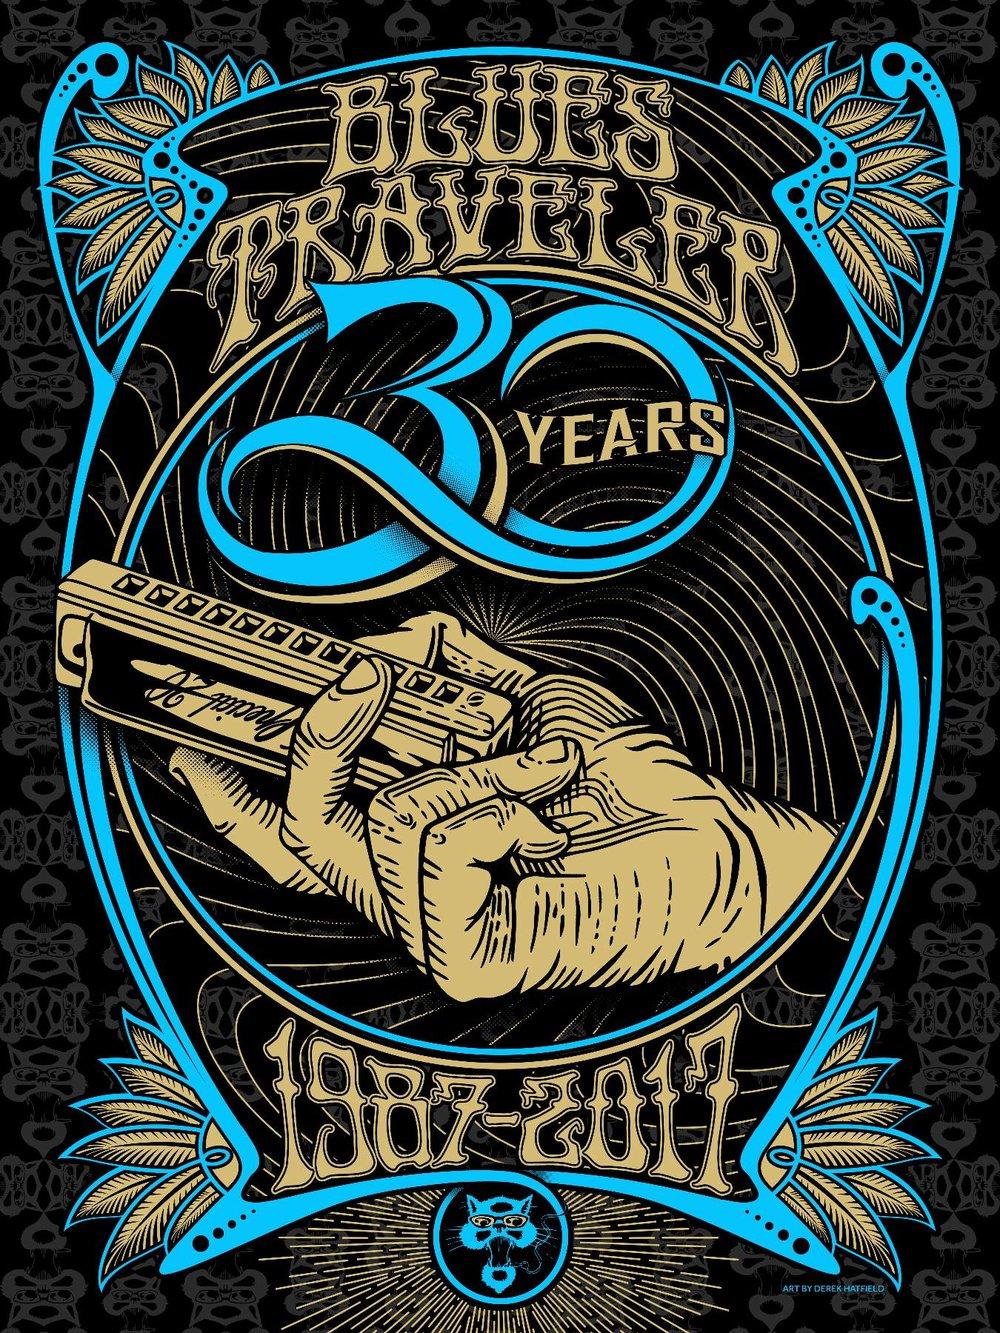 Blues Traveler - 30th Anniversary